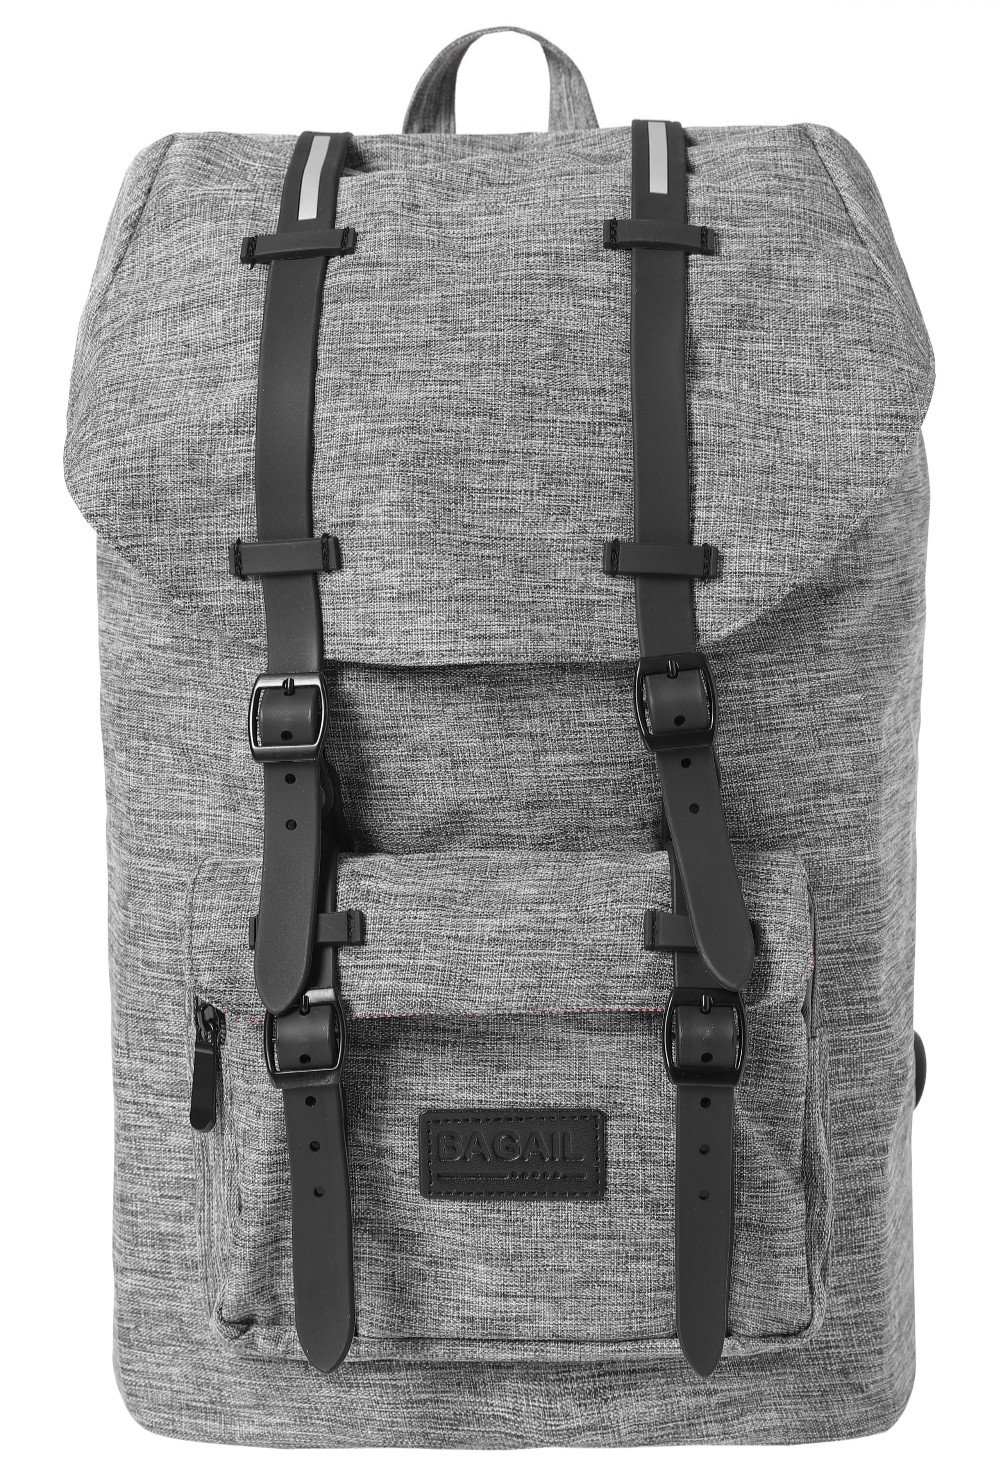 4c3f087614d8 Amazon.com  Bagail Casual Large Vintage Canvas Travel Backpacks Laptop  College School Bags (Dark Grey)  Bagail